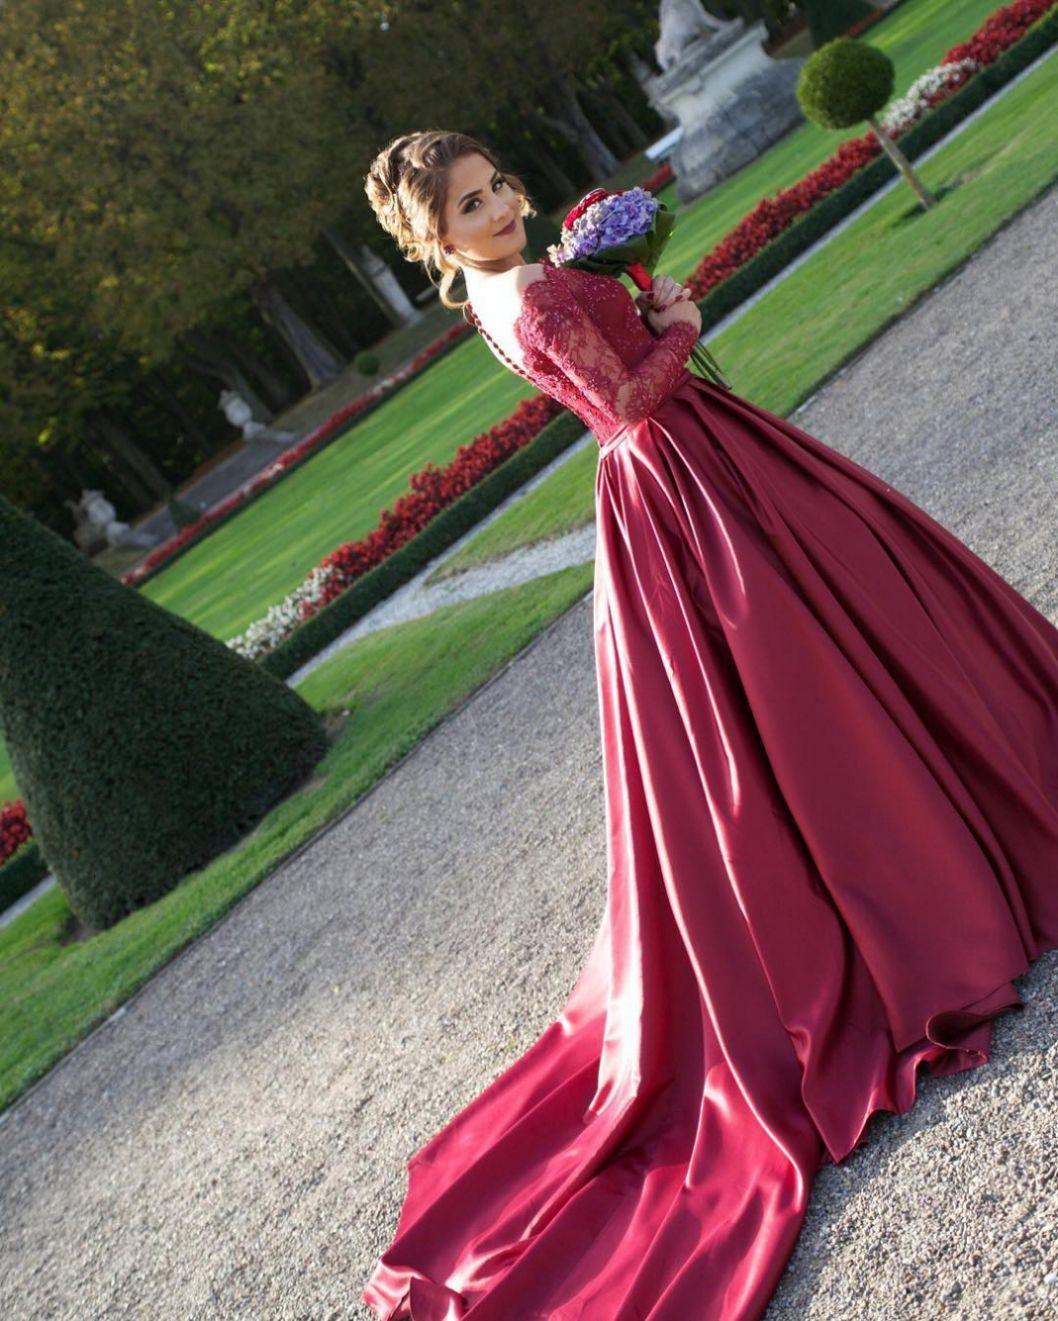 Red dress prom dress red prom dress long dress long red dress